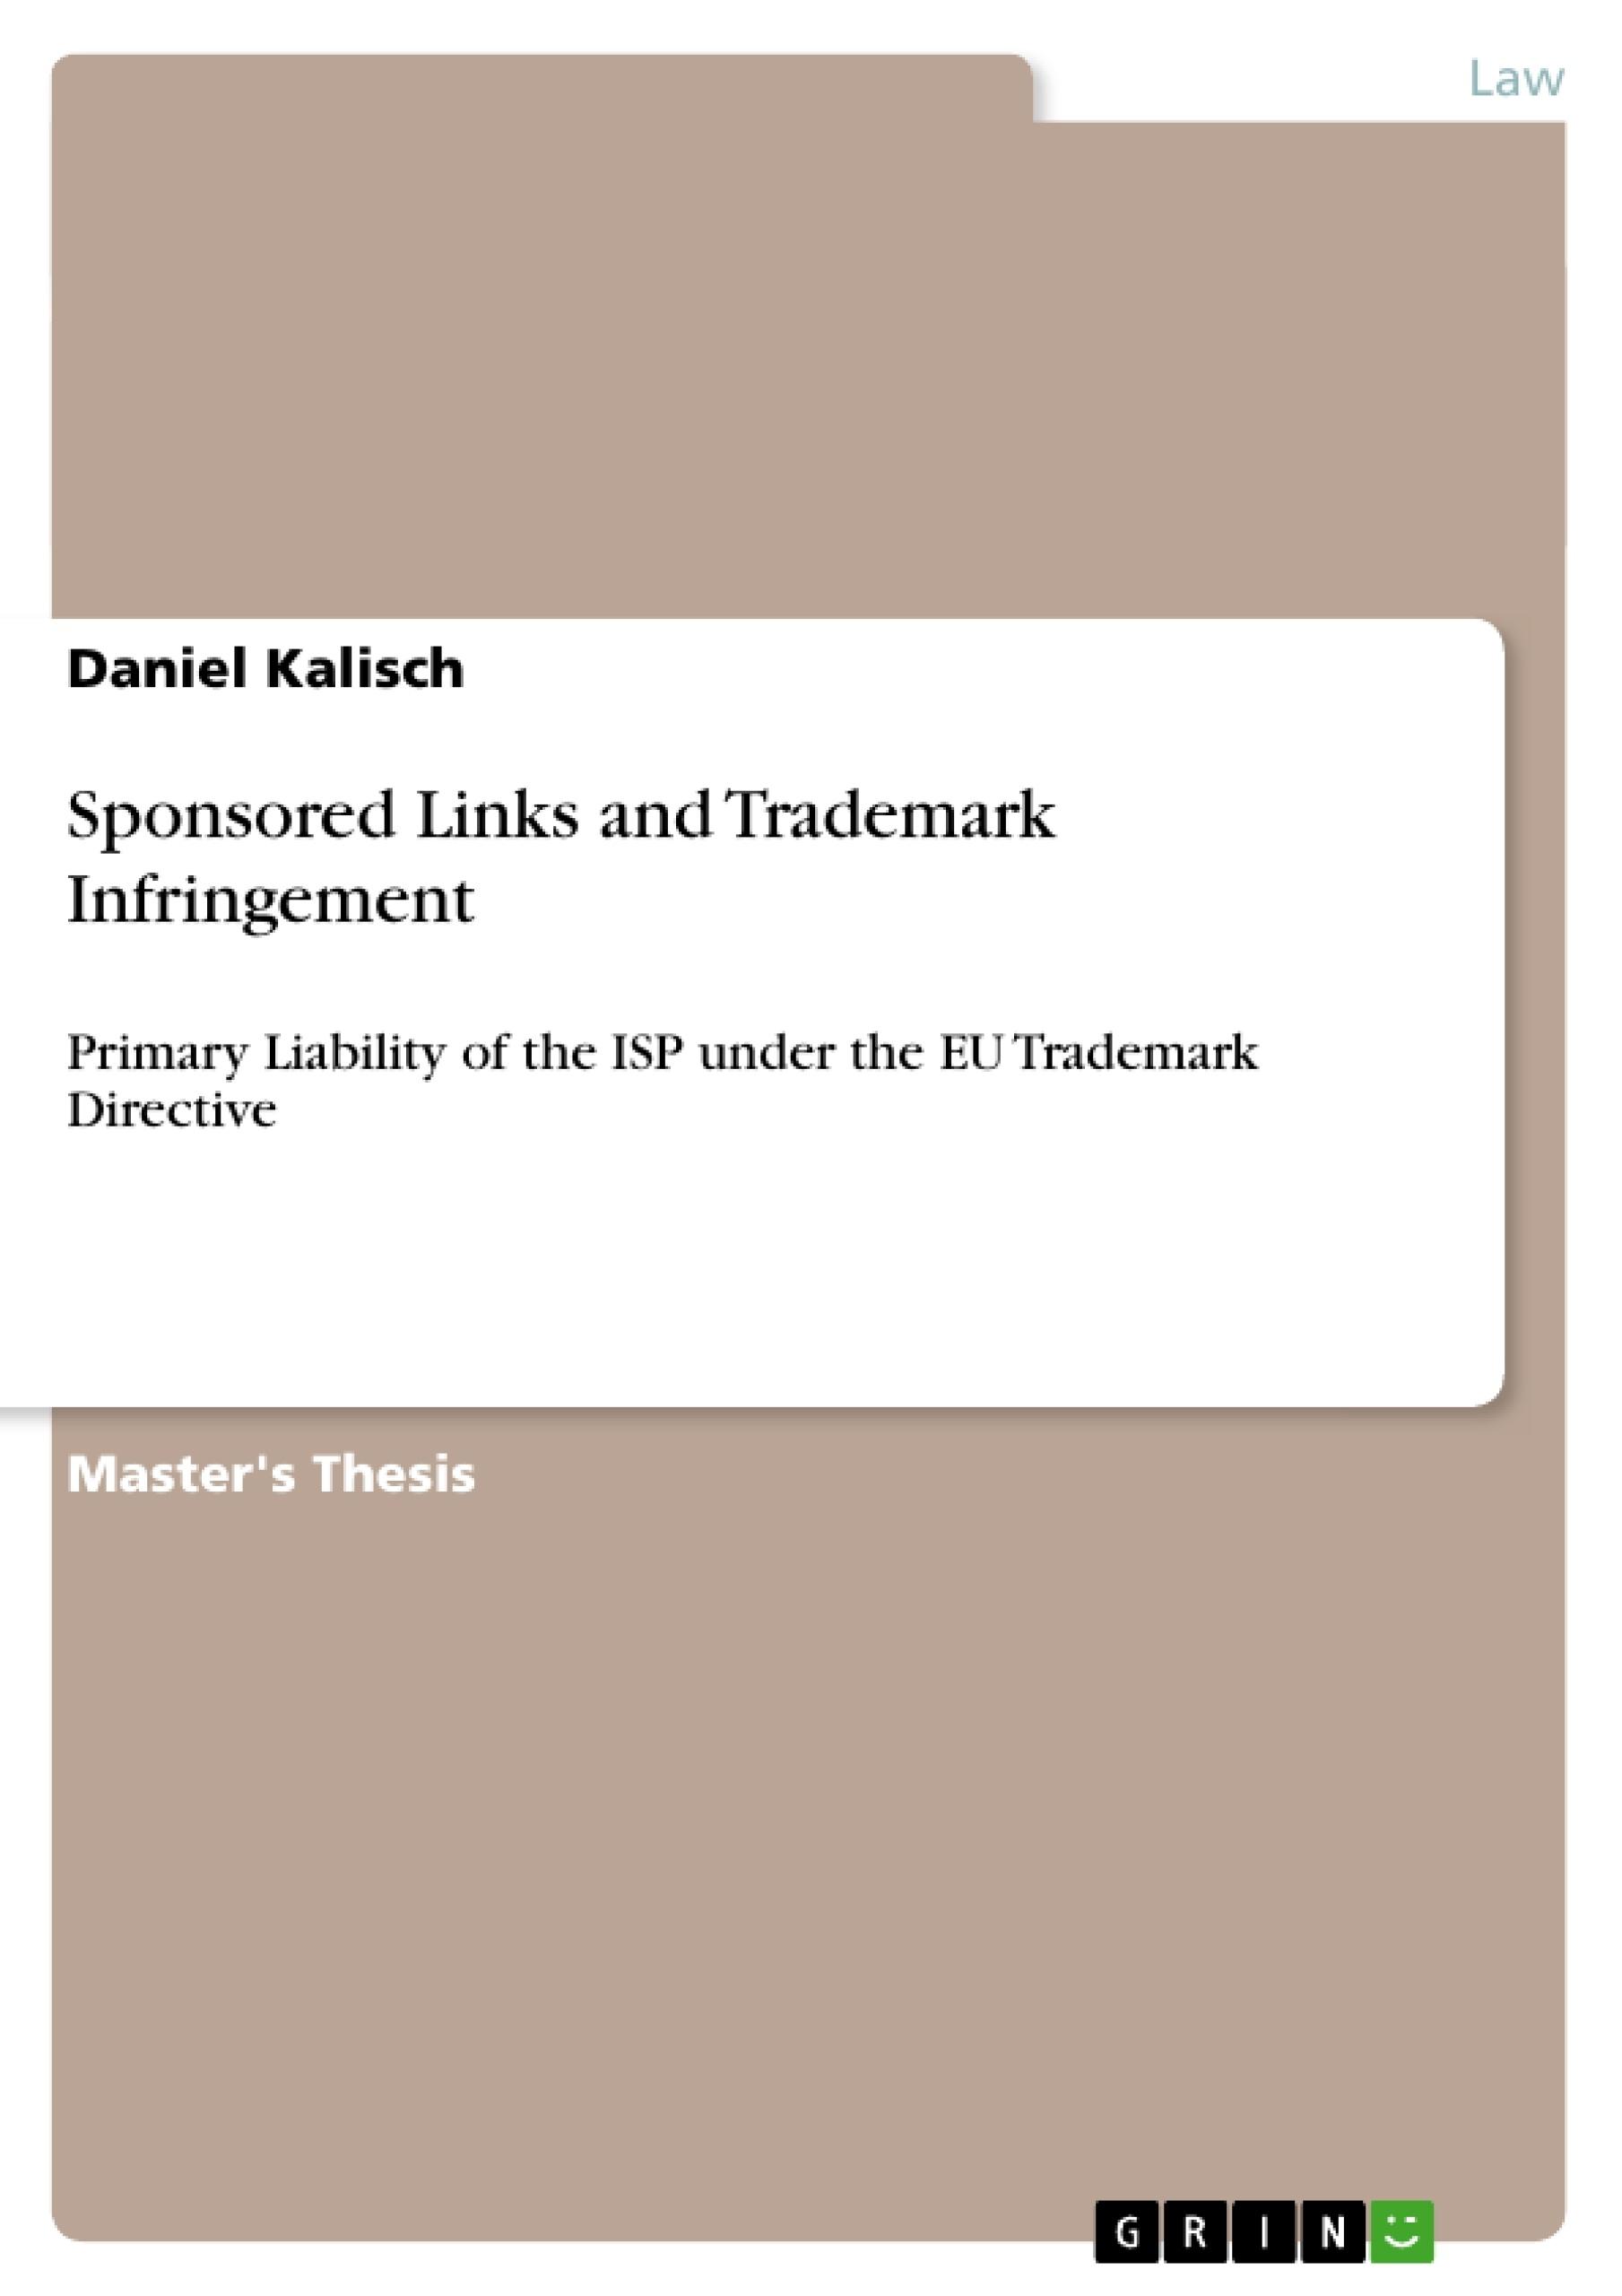 Title: Sponsored Links and Trademark Infringement